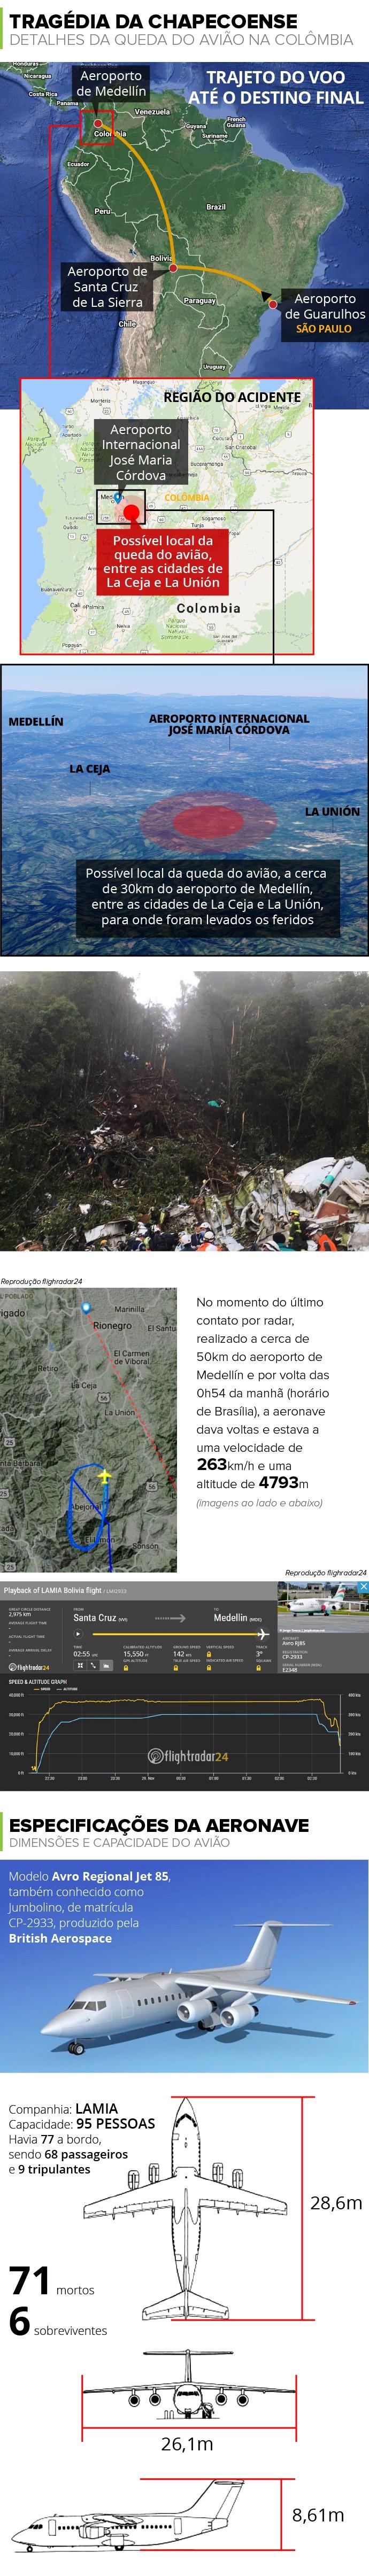 Info-QUEDA-AVIAO-Chapecoense-L (Foto: infoesporte)